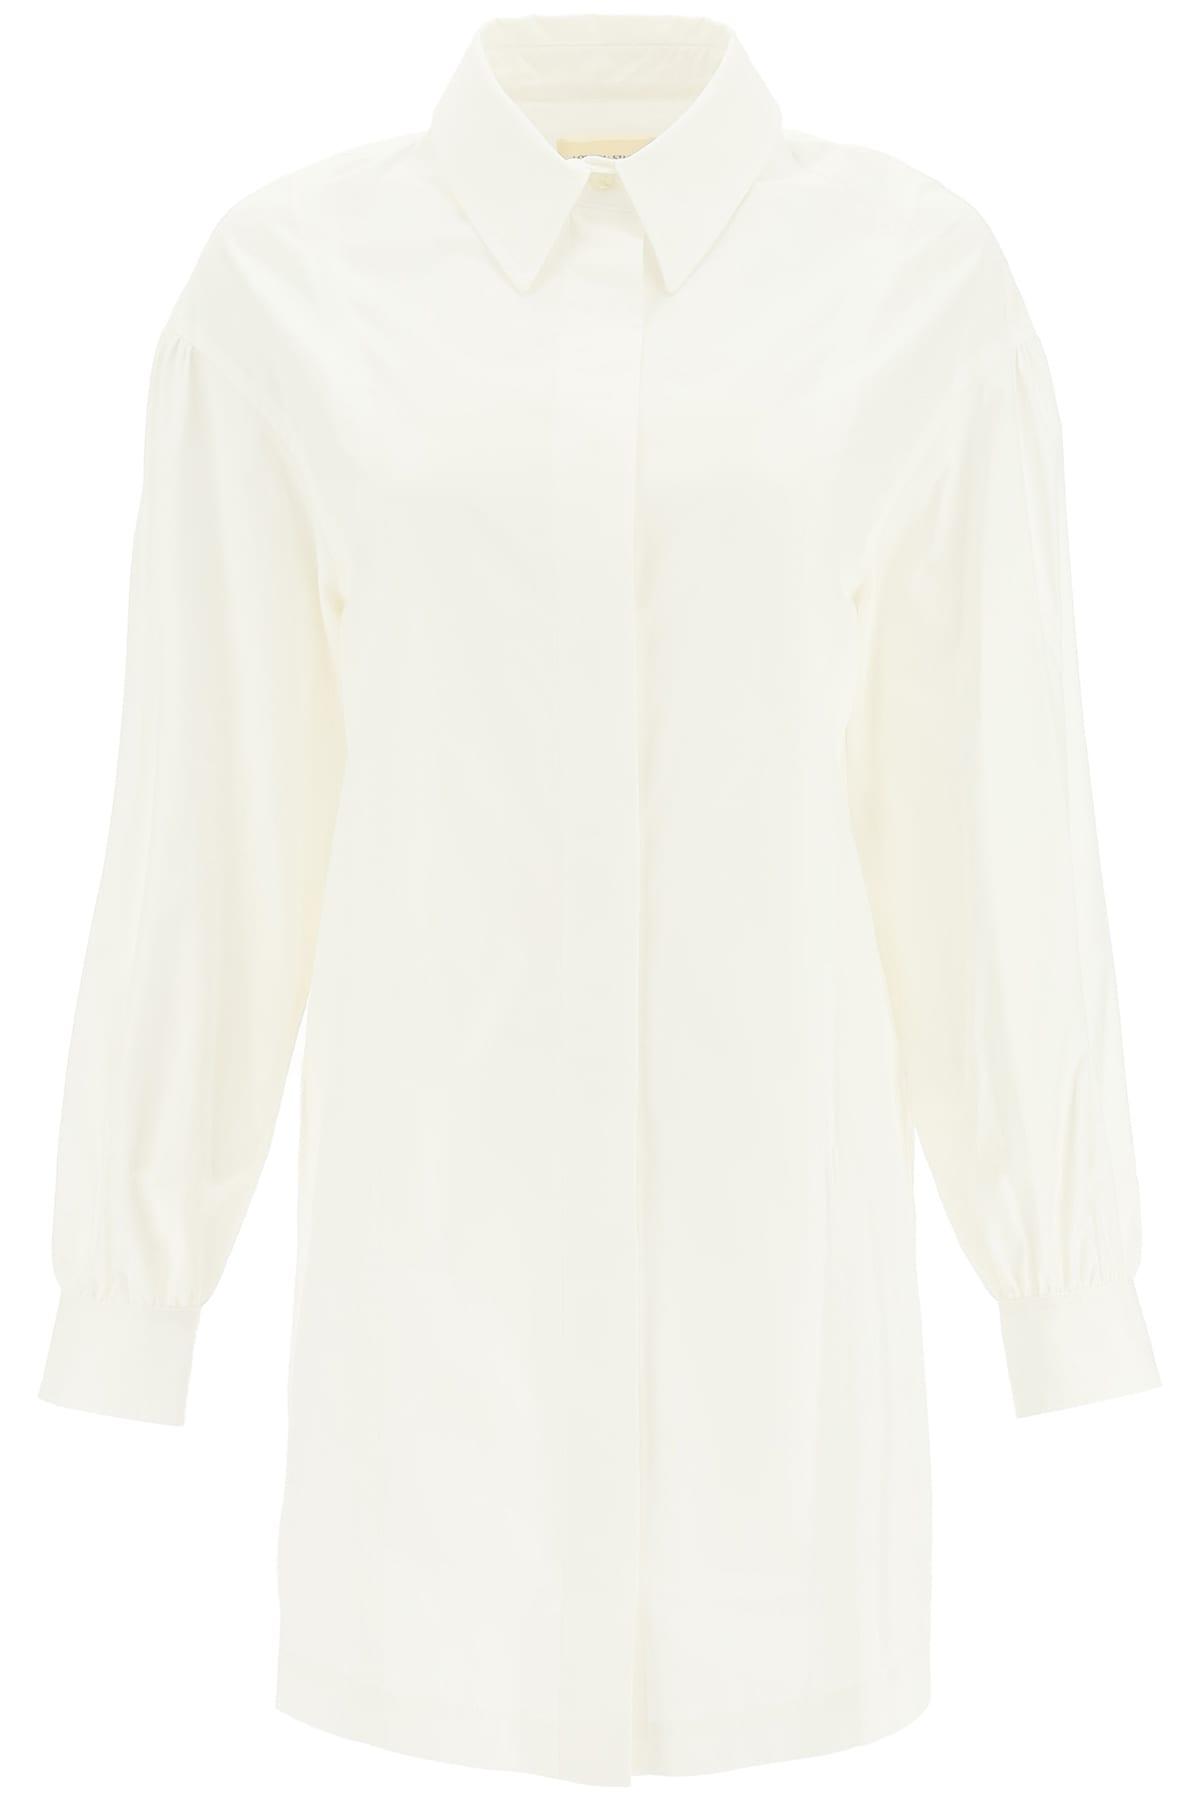 Loulou Studio Clothing ZENA COTTON MINI DRESS